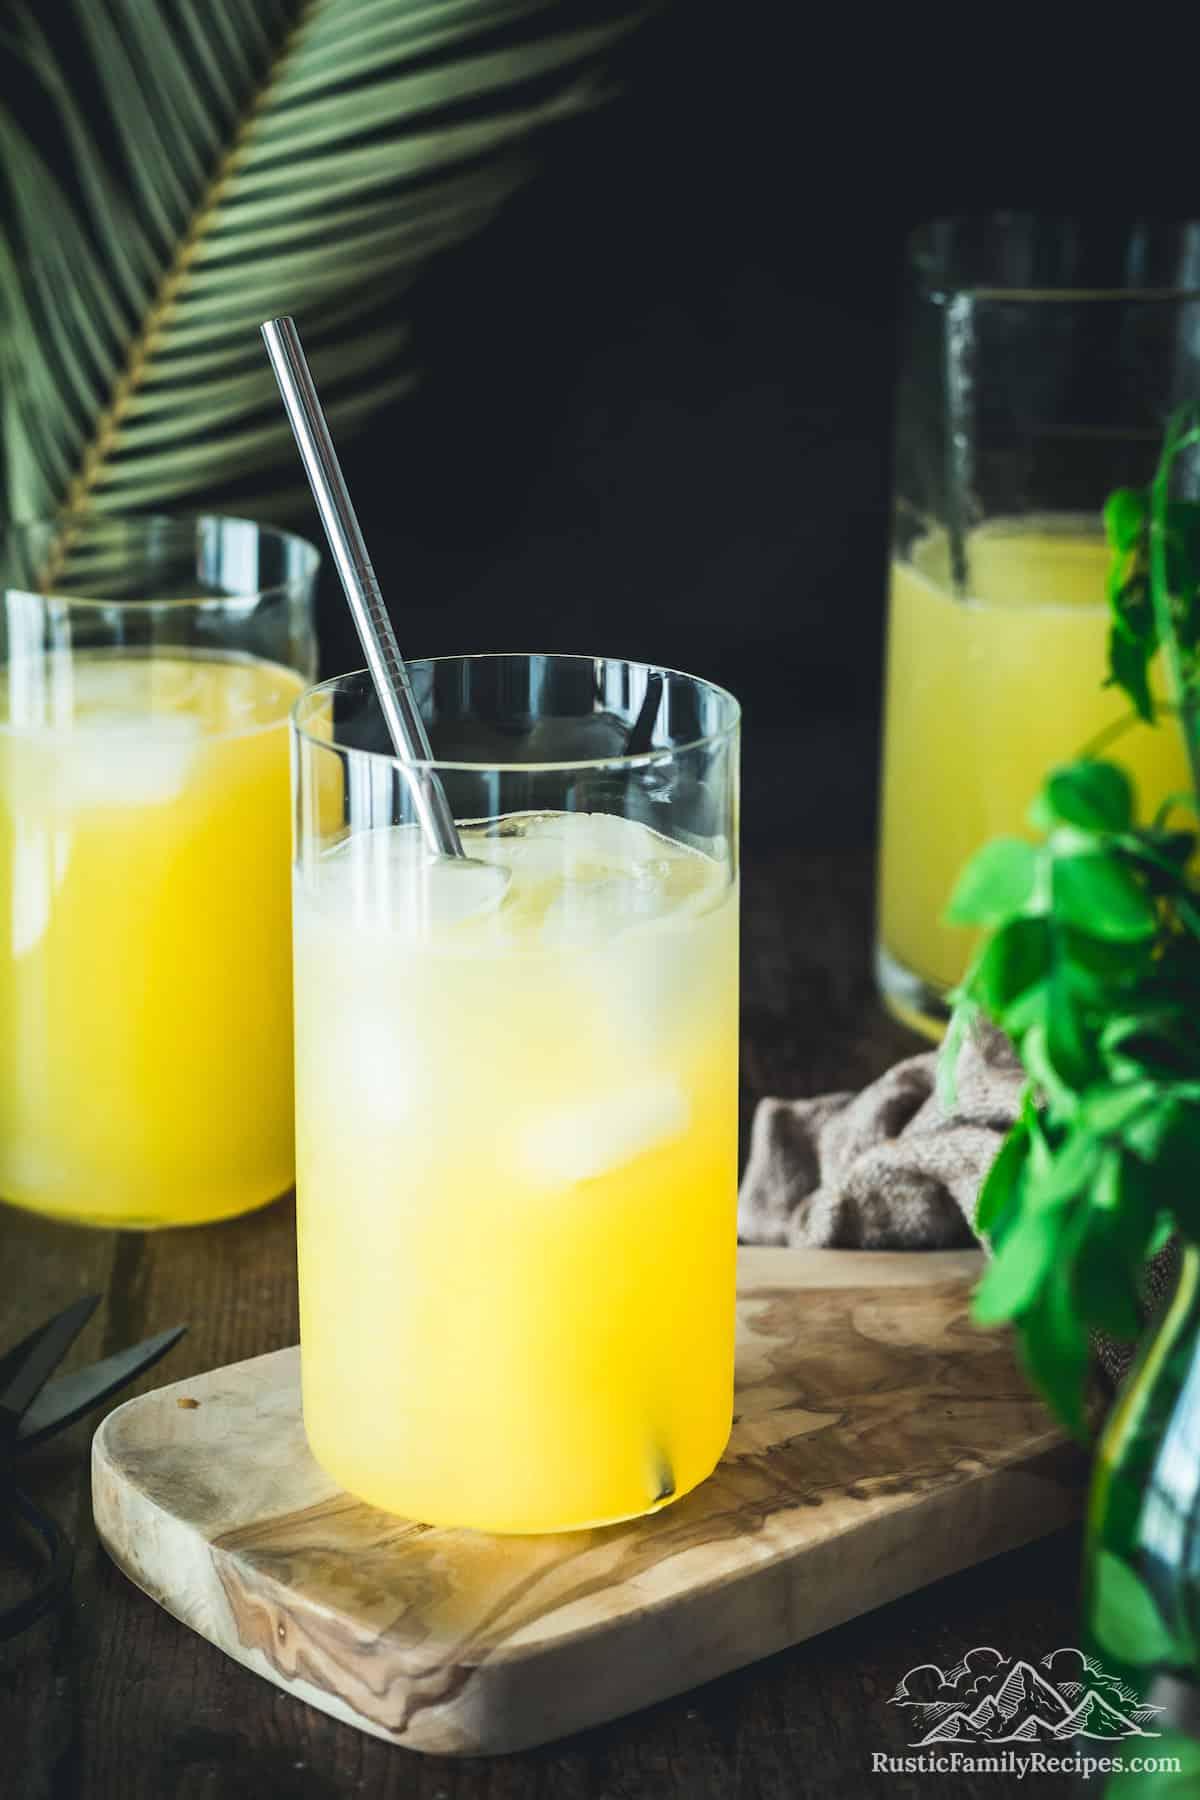 Three glasses of mango lemonade with ice